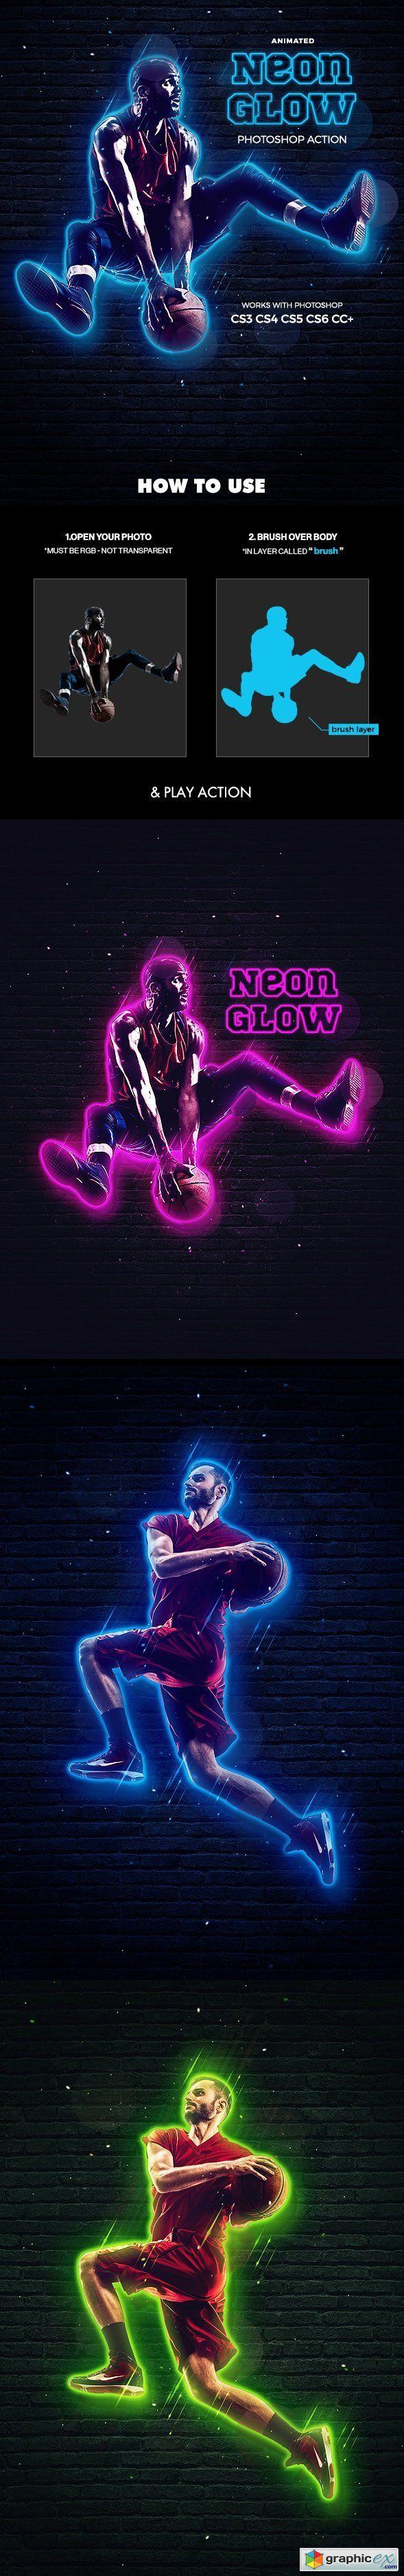 Neon Glow Action Animated Neon glow